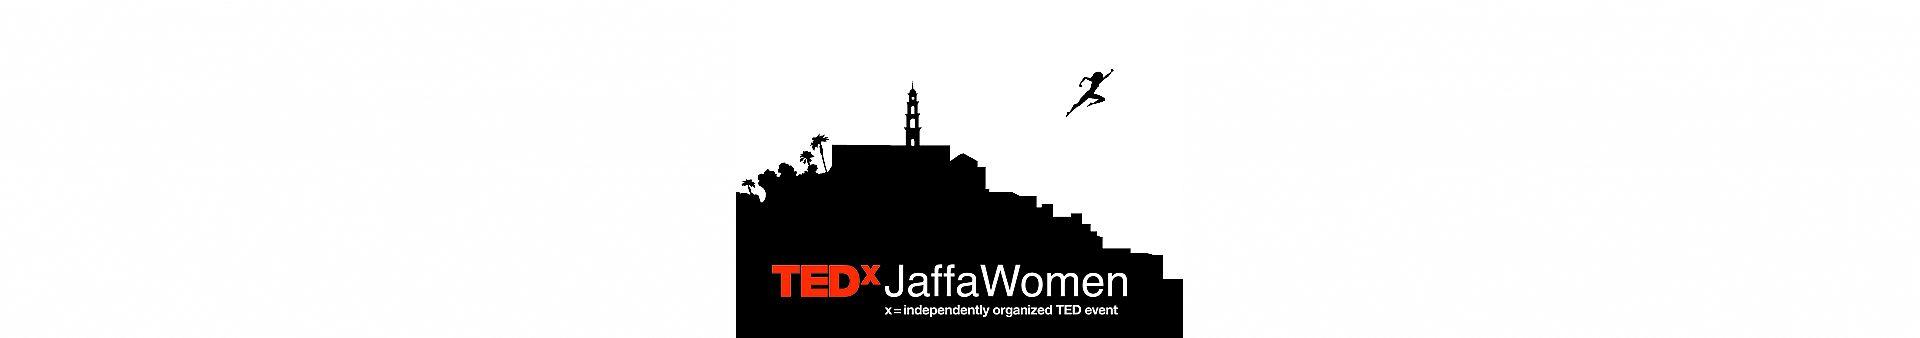 TED x Jaffa Women